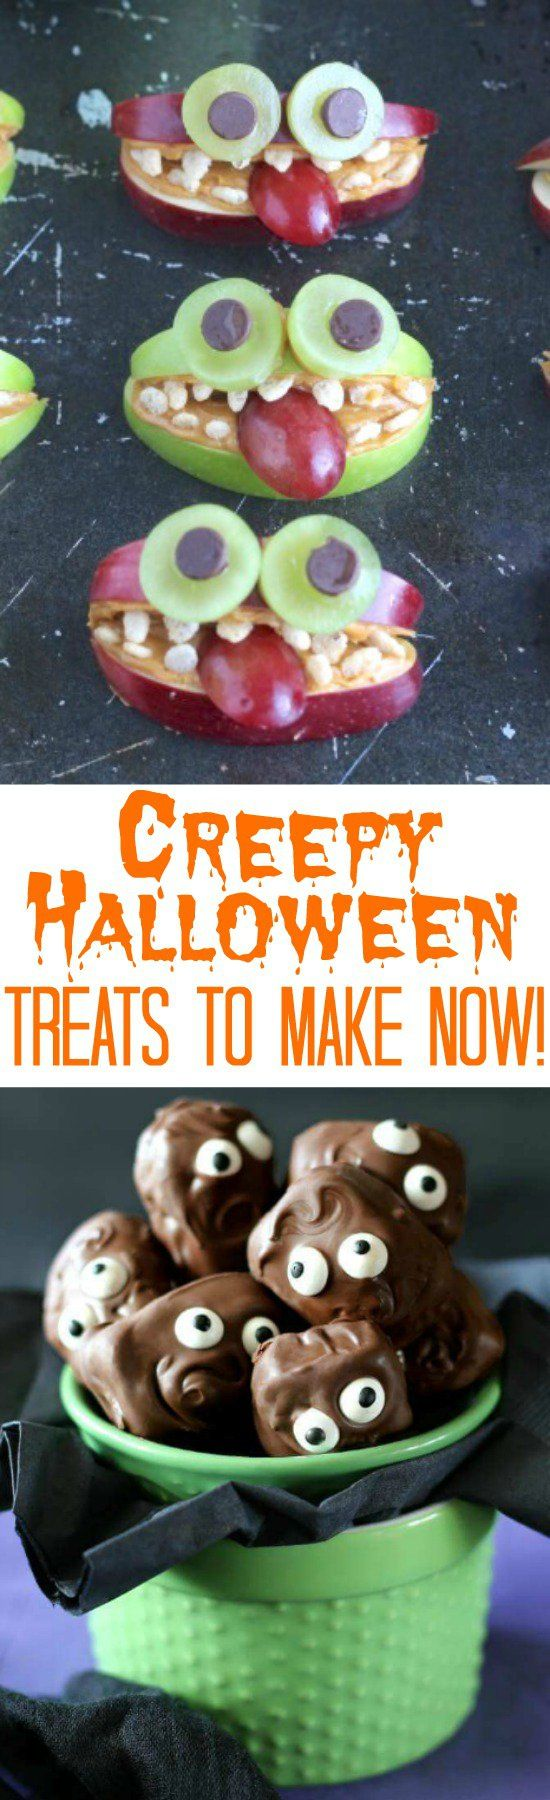 987 best ............Halloween Recipes images on Pinterest